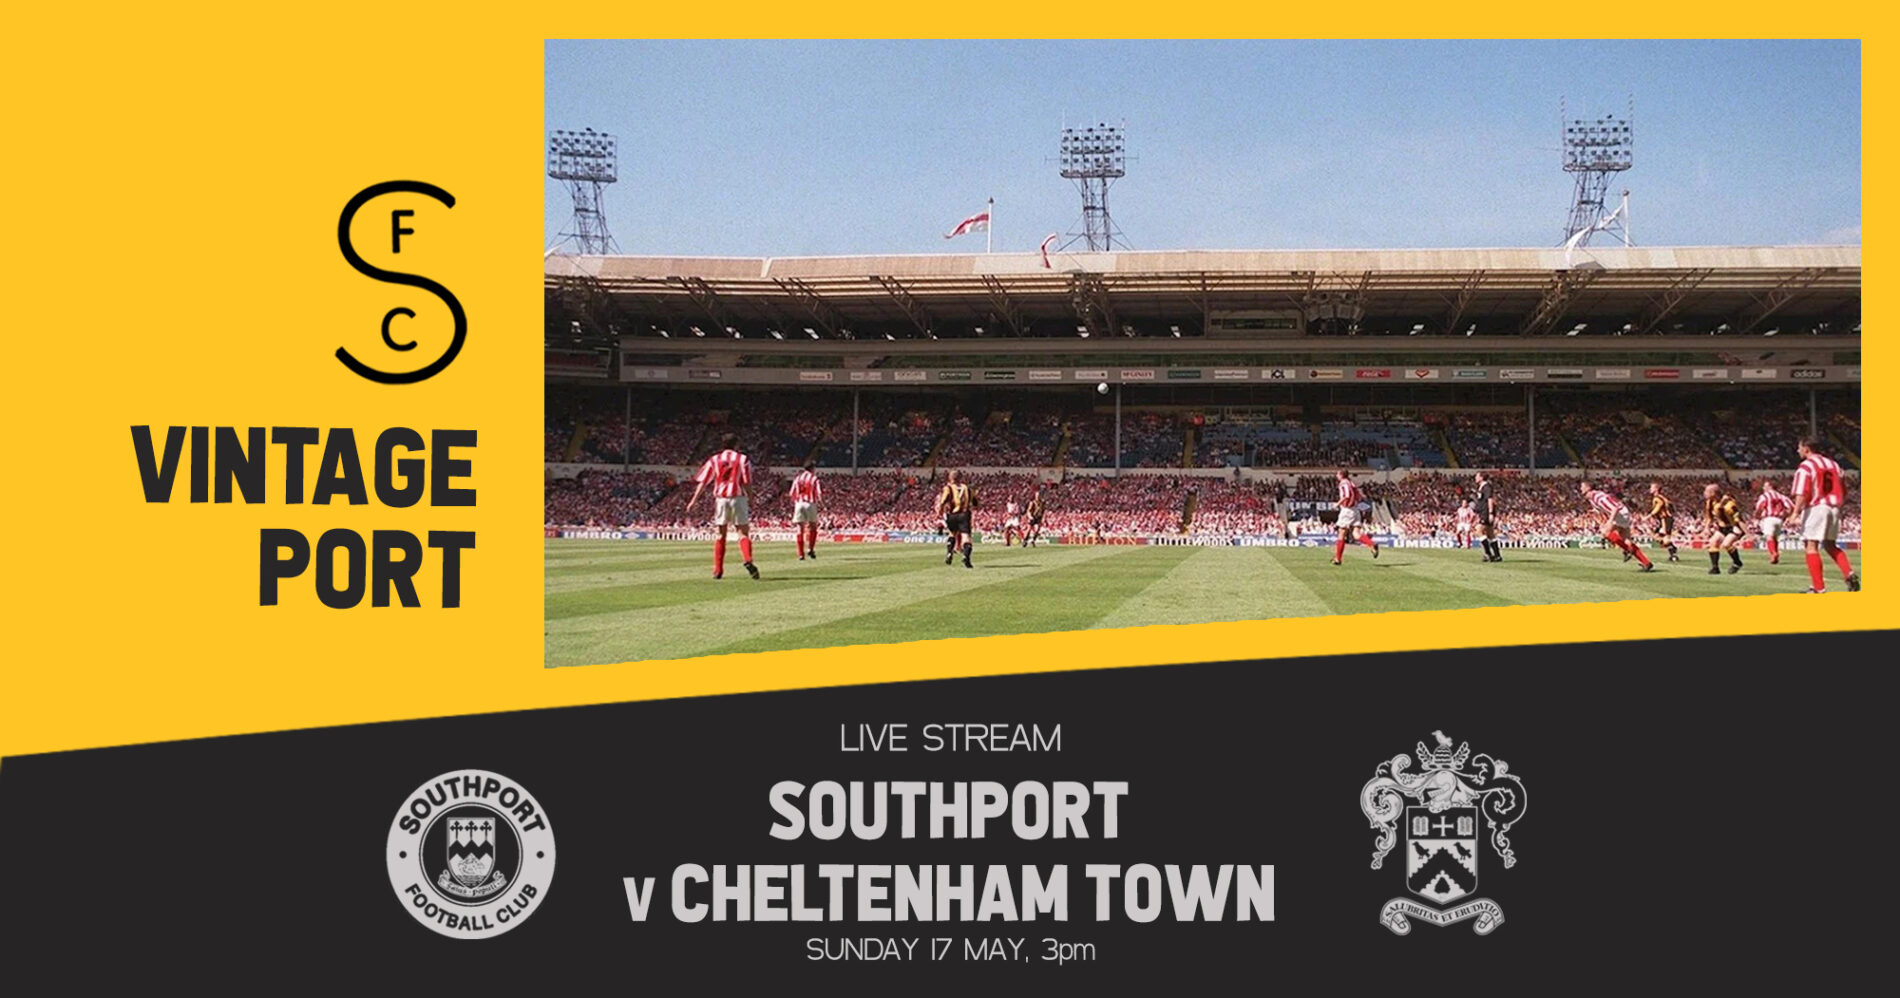 VINTAGE PORT | Southport v Cheltenham Town